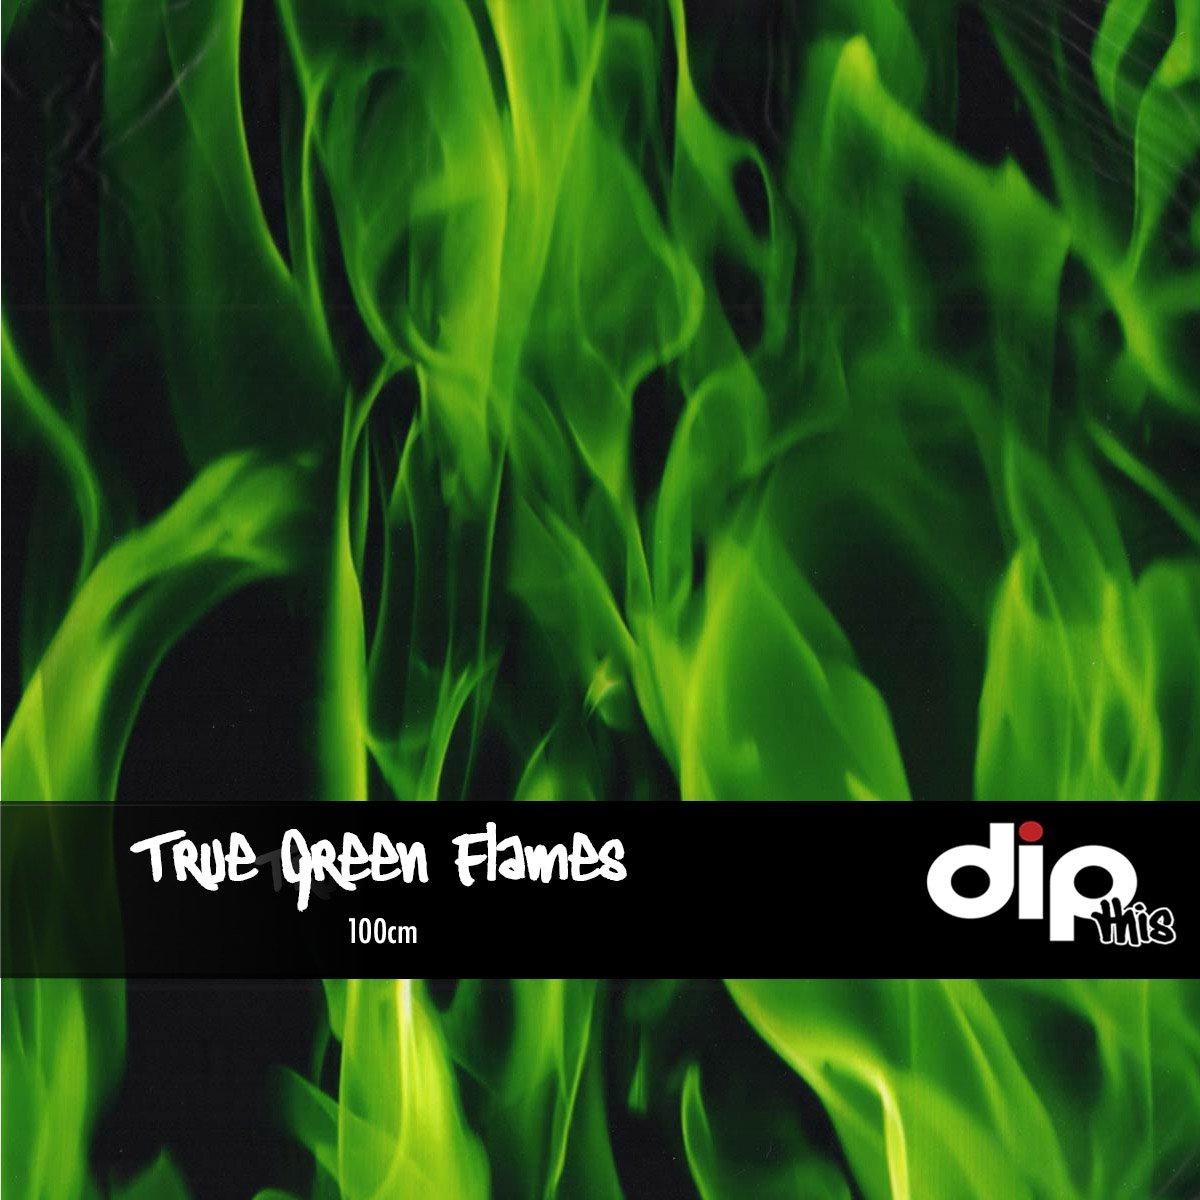 True Green Flames Dip Kit